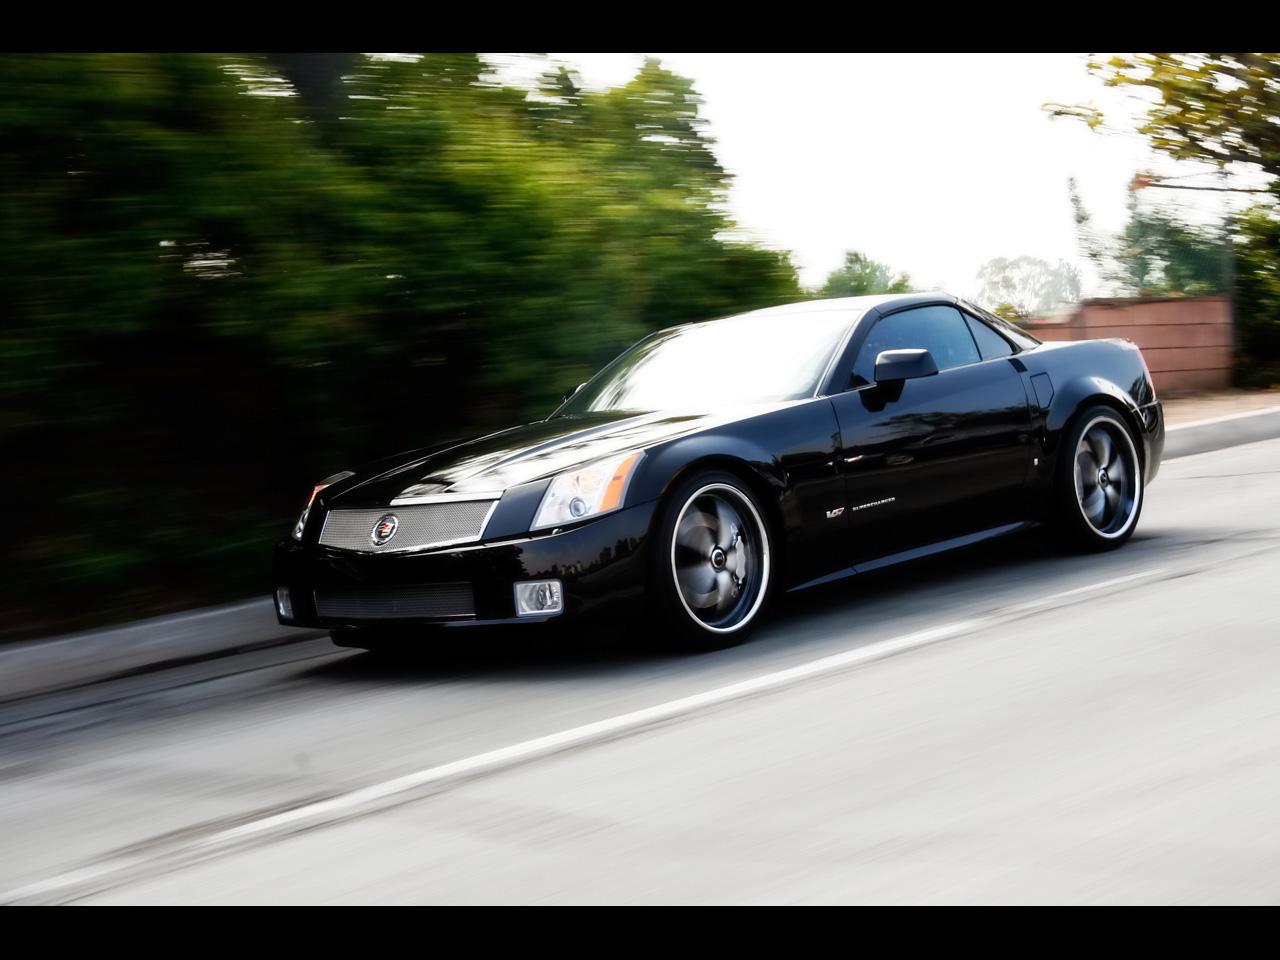 Cadillac Sport Car - Sports Cars